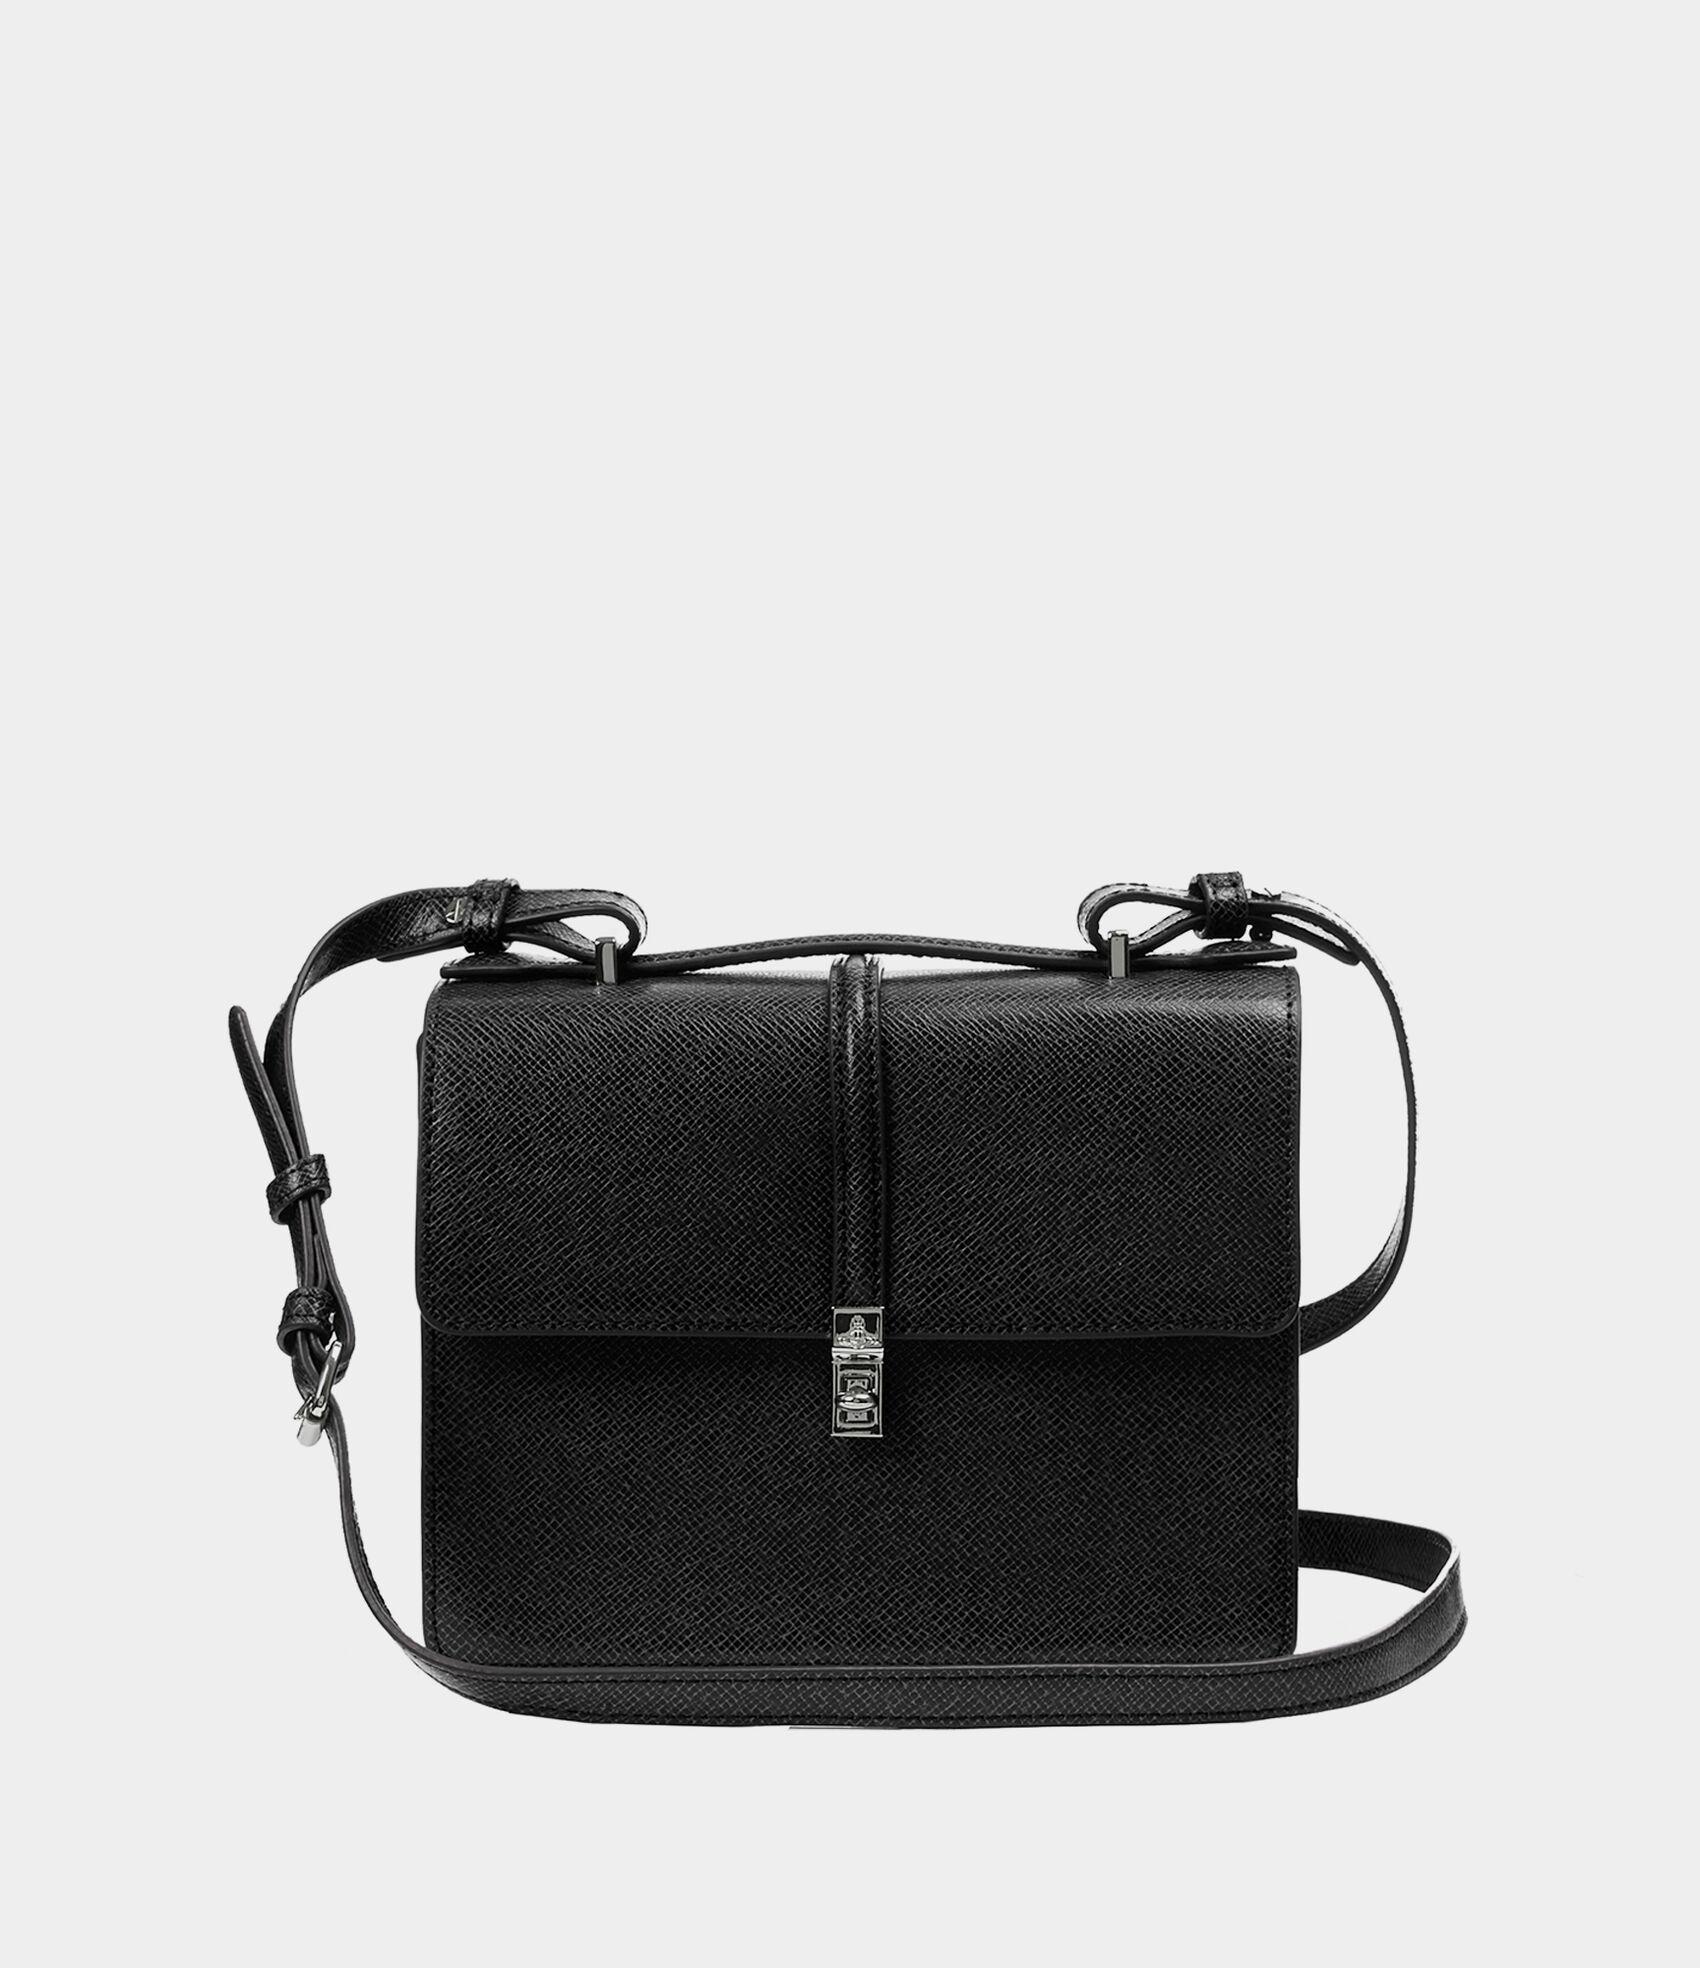 08569603ef469 Vivienne Westwood Women s Designer Crossbody Bags